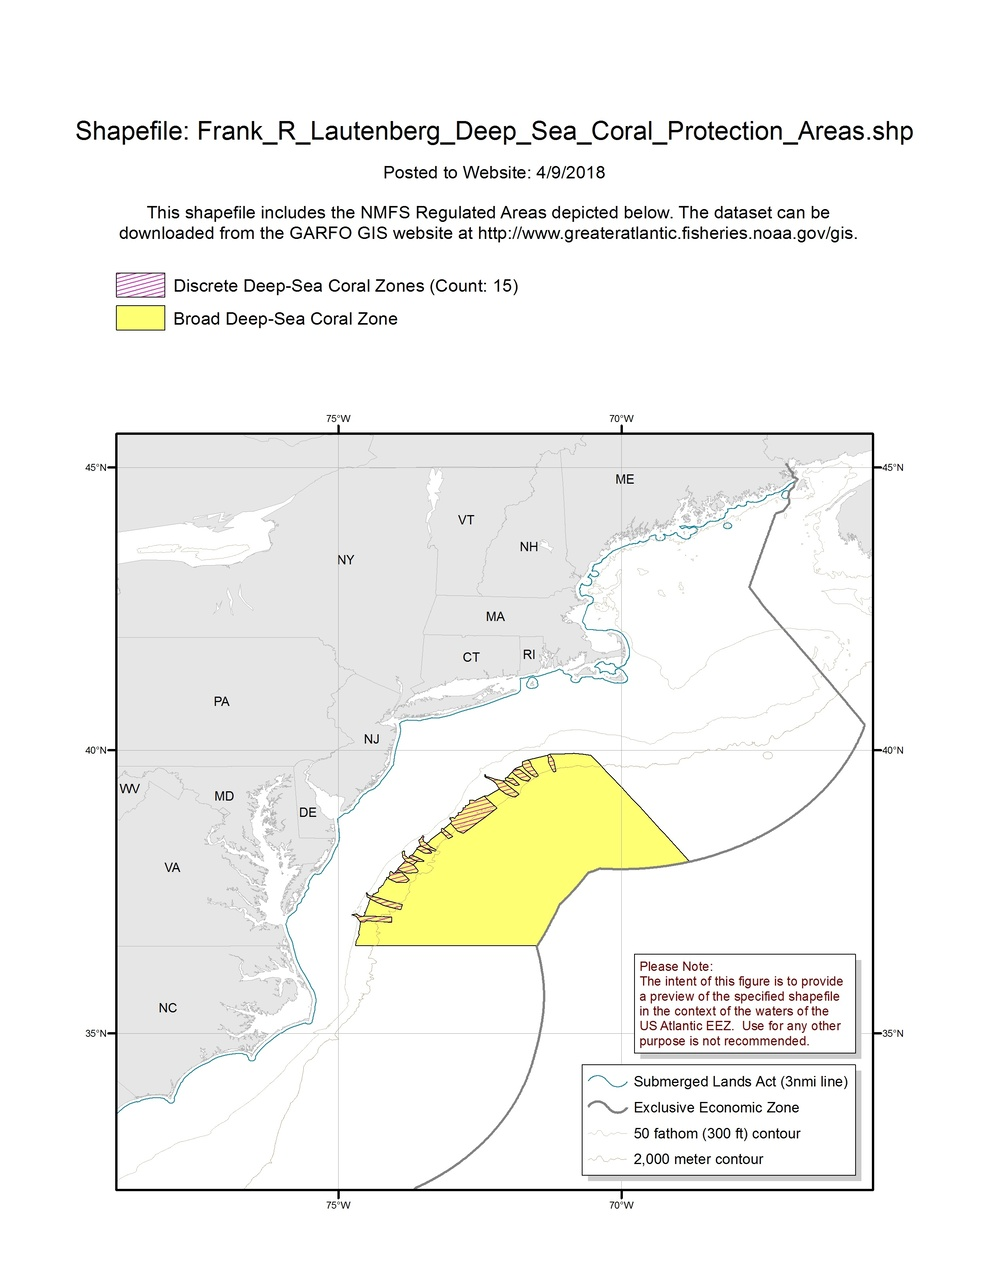 Frank_R_Lautenberg_Deep_Sea_Coral_Protection_Areas_MAP.jpg